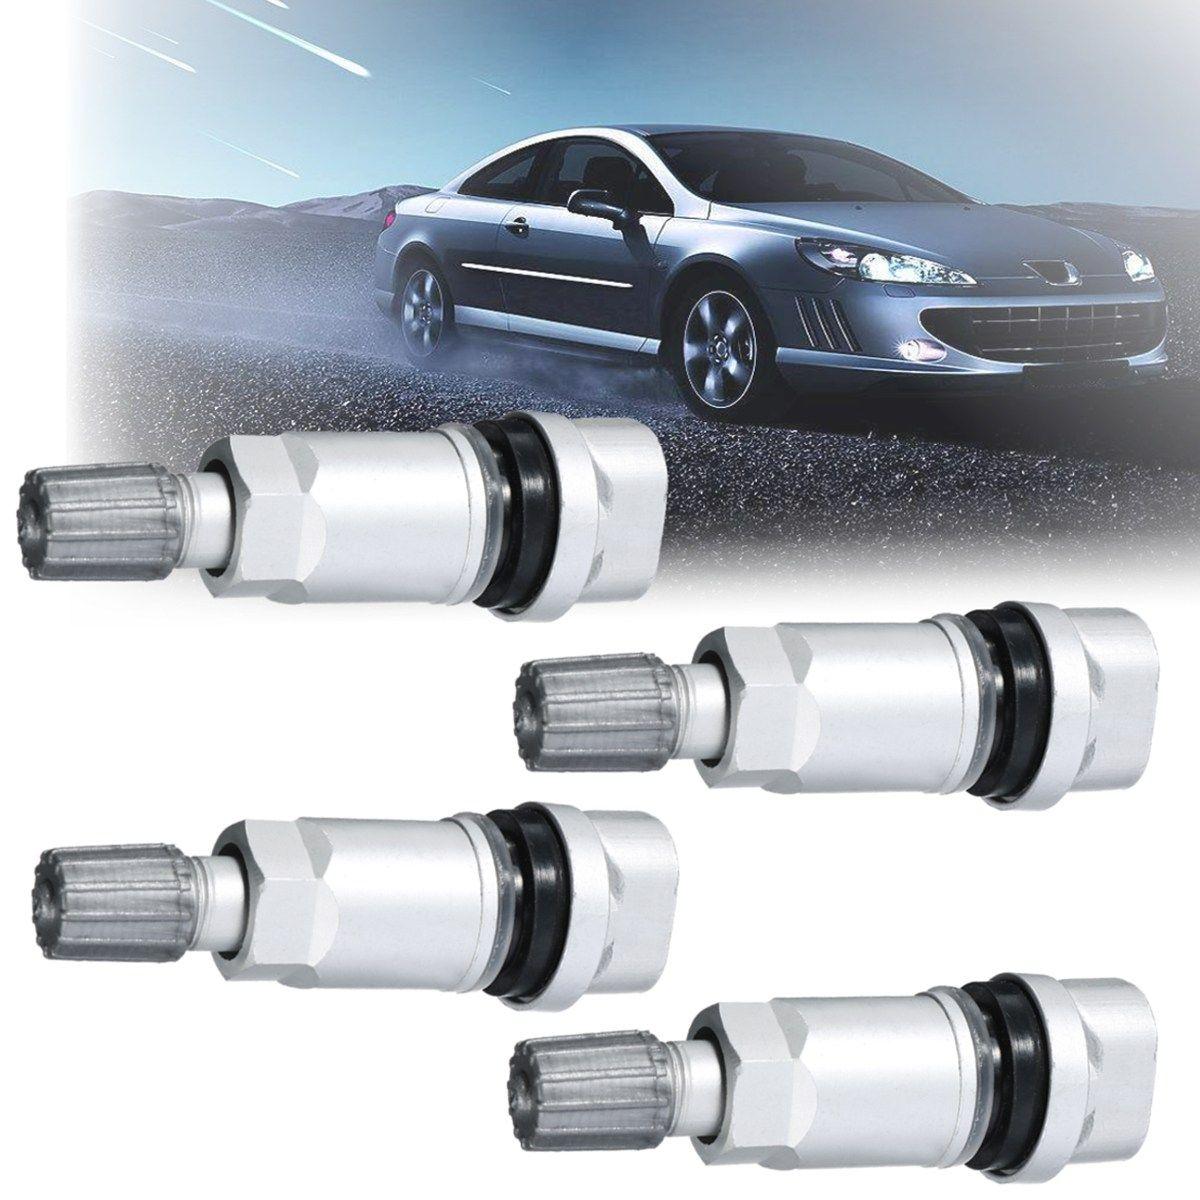 4Pcs TPMS Tyre Air Pressure Sensor 5WK96841 2045431 for Peugeot 407 607 807 /Citroen C4 C5 C6 Monitor System